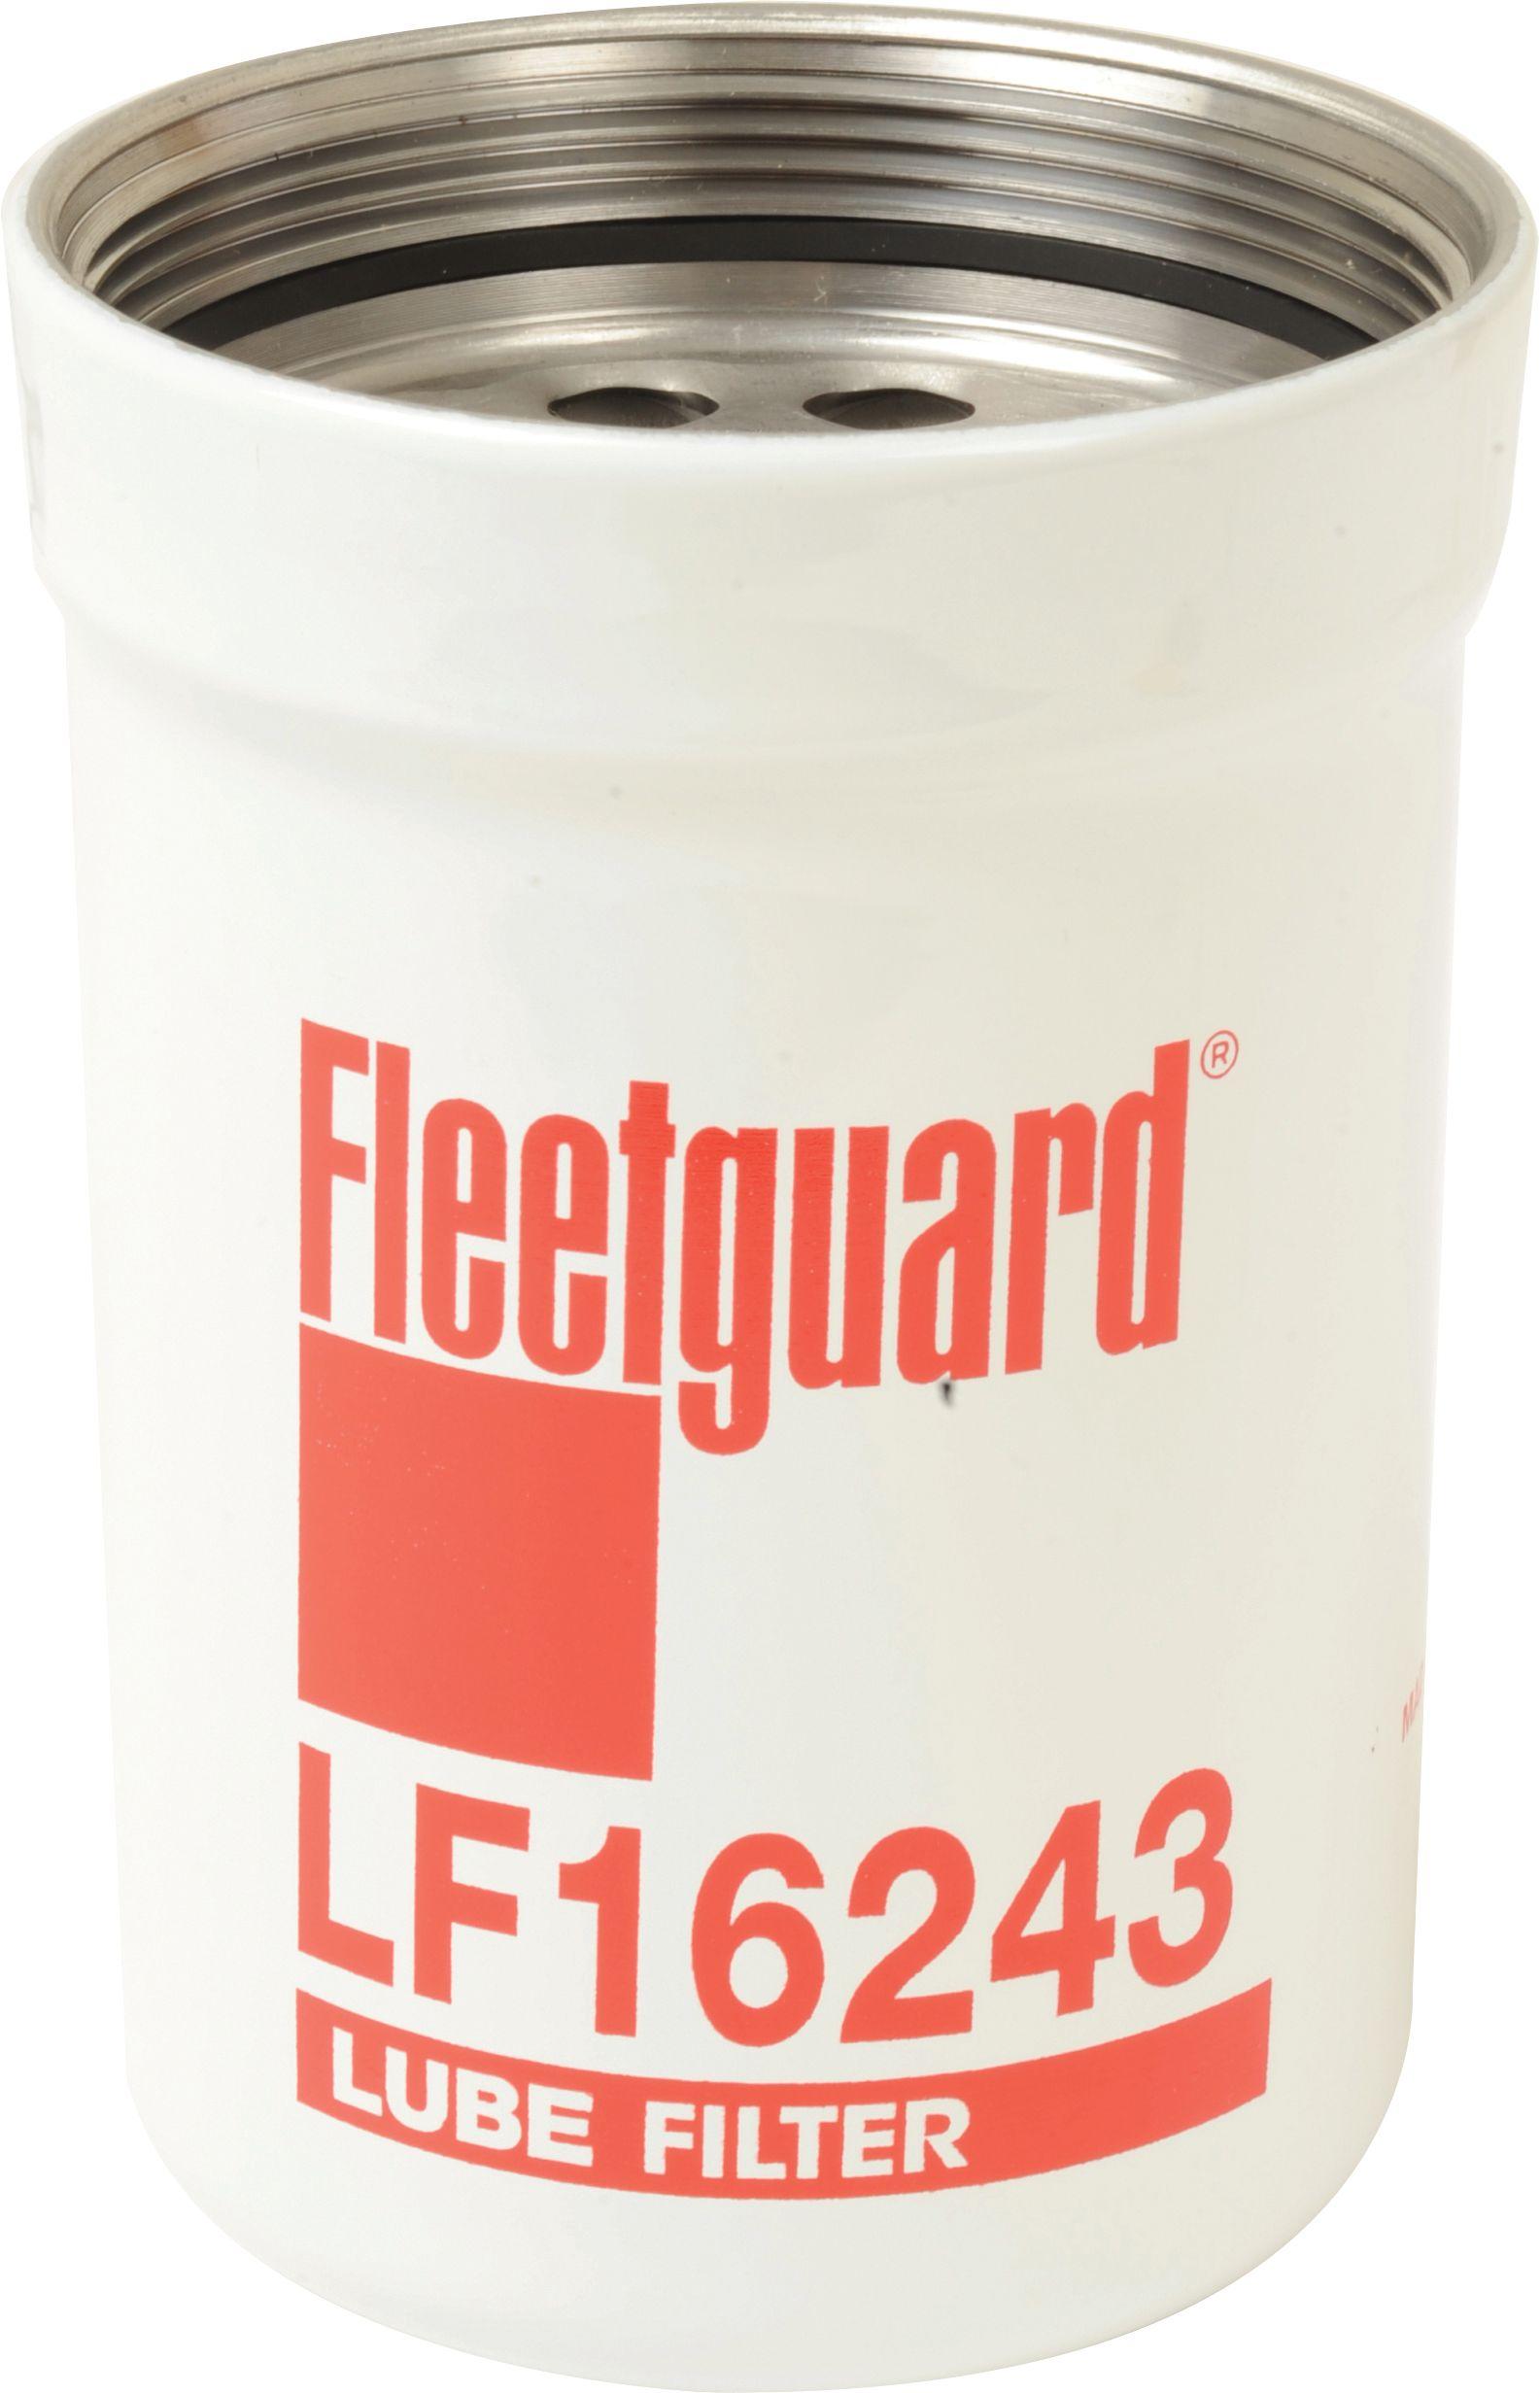 CLAAS OIL FILTER LF16243